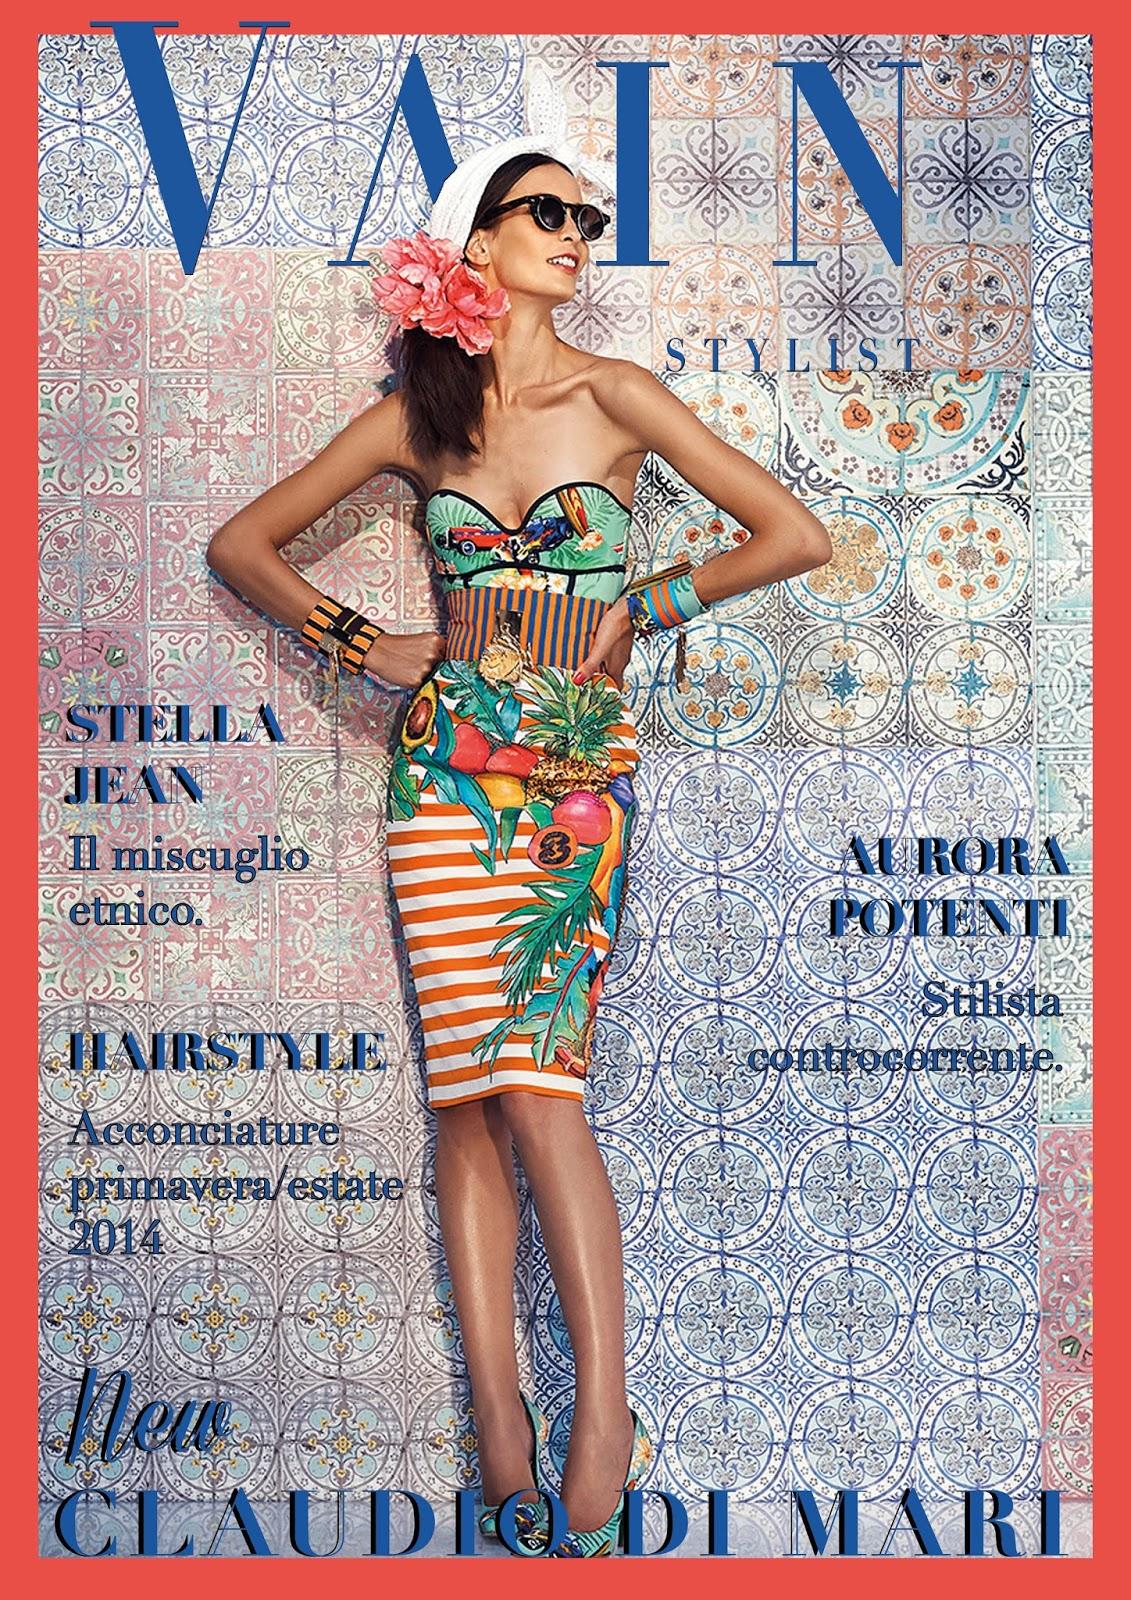 http://issuu.com/vainmagazines/docs/stylist_marzo_ita/35?e=11043344/6928407